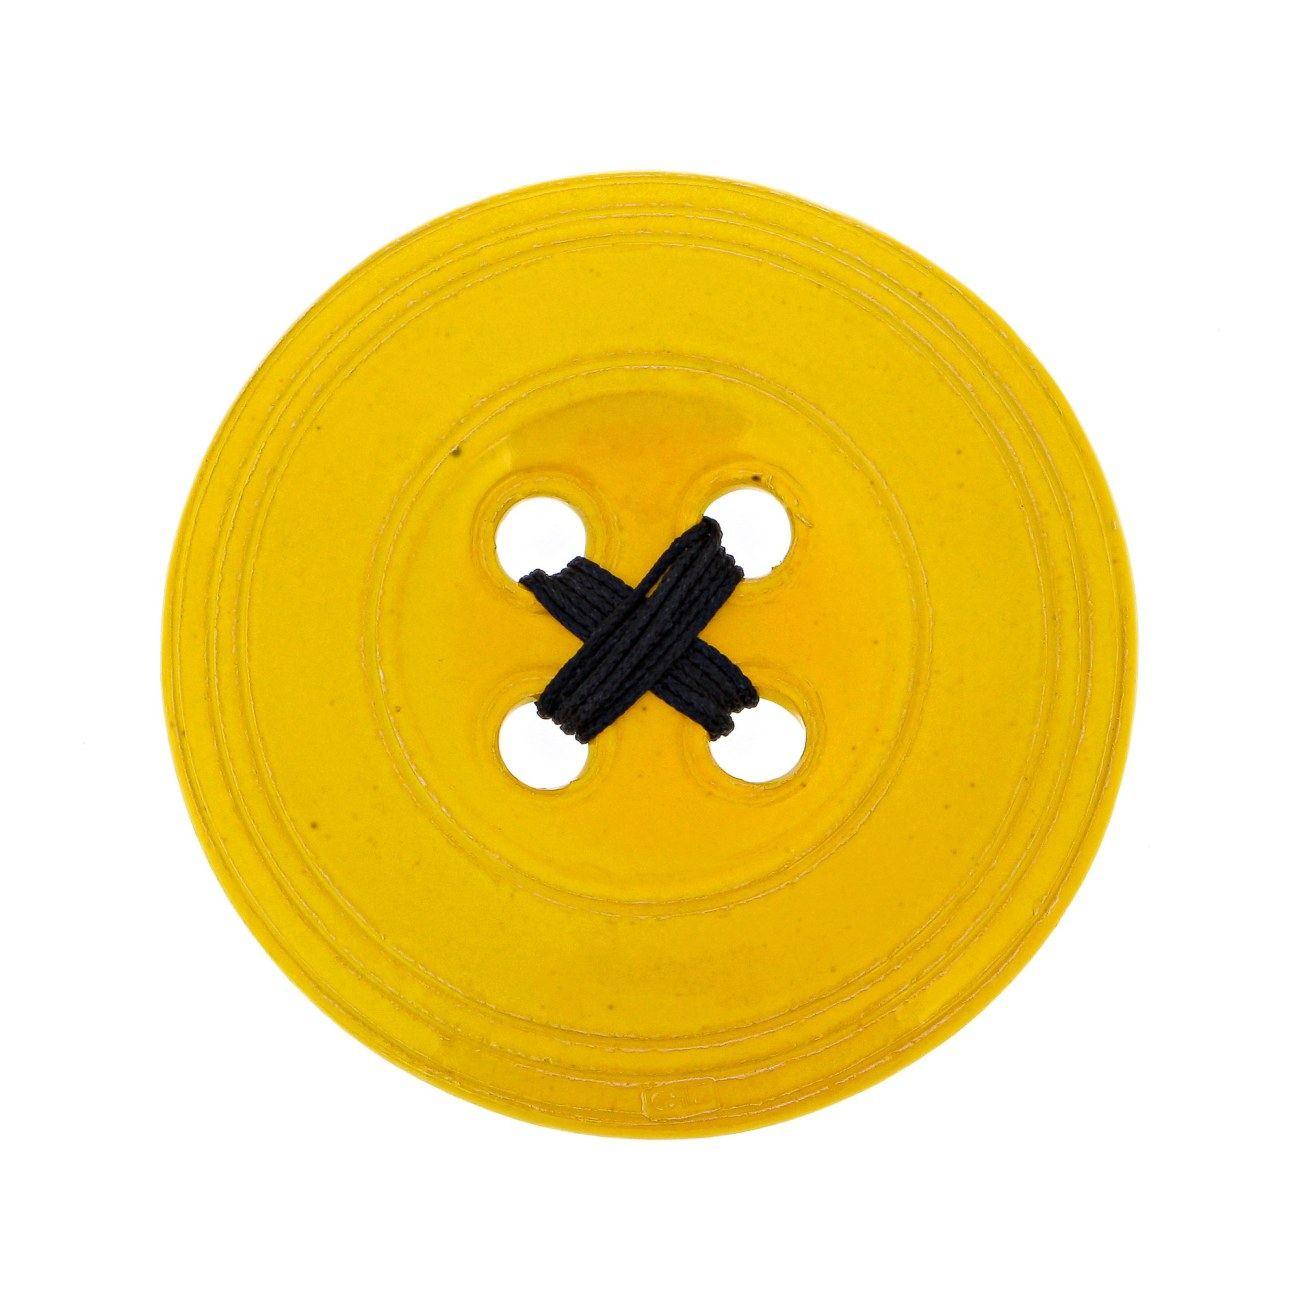 Ceramic Yellow Button - Modern Handmade Wall Art Decor - Large Size ...